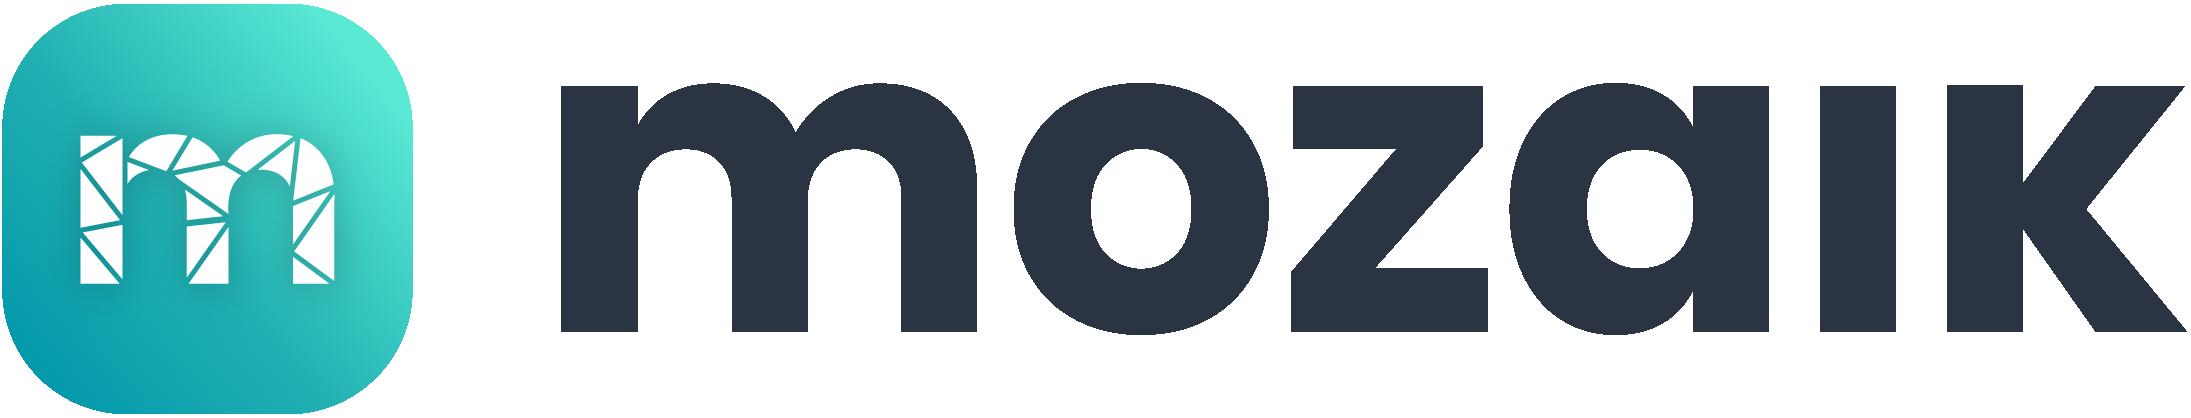 Mozaik_Logo_wort-bild-marke